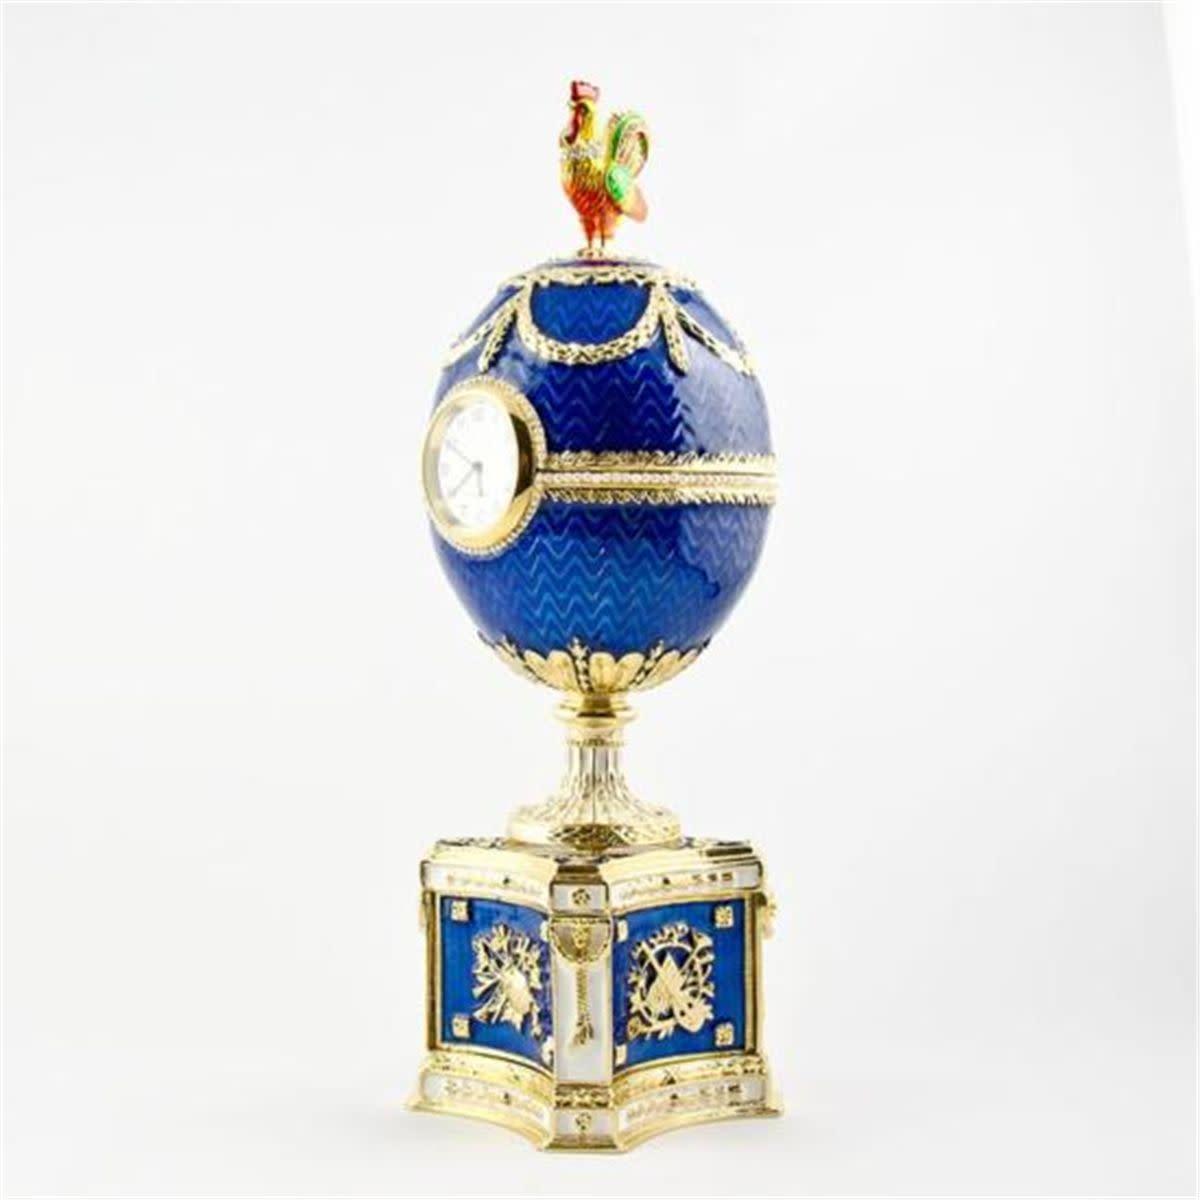 Kelch Chanticleer Egg (1904)